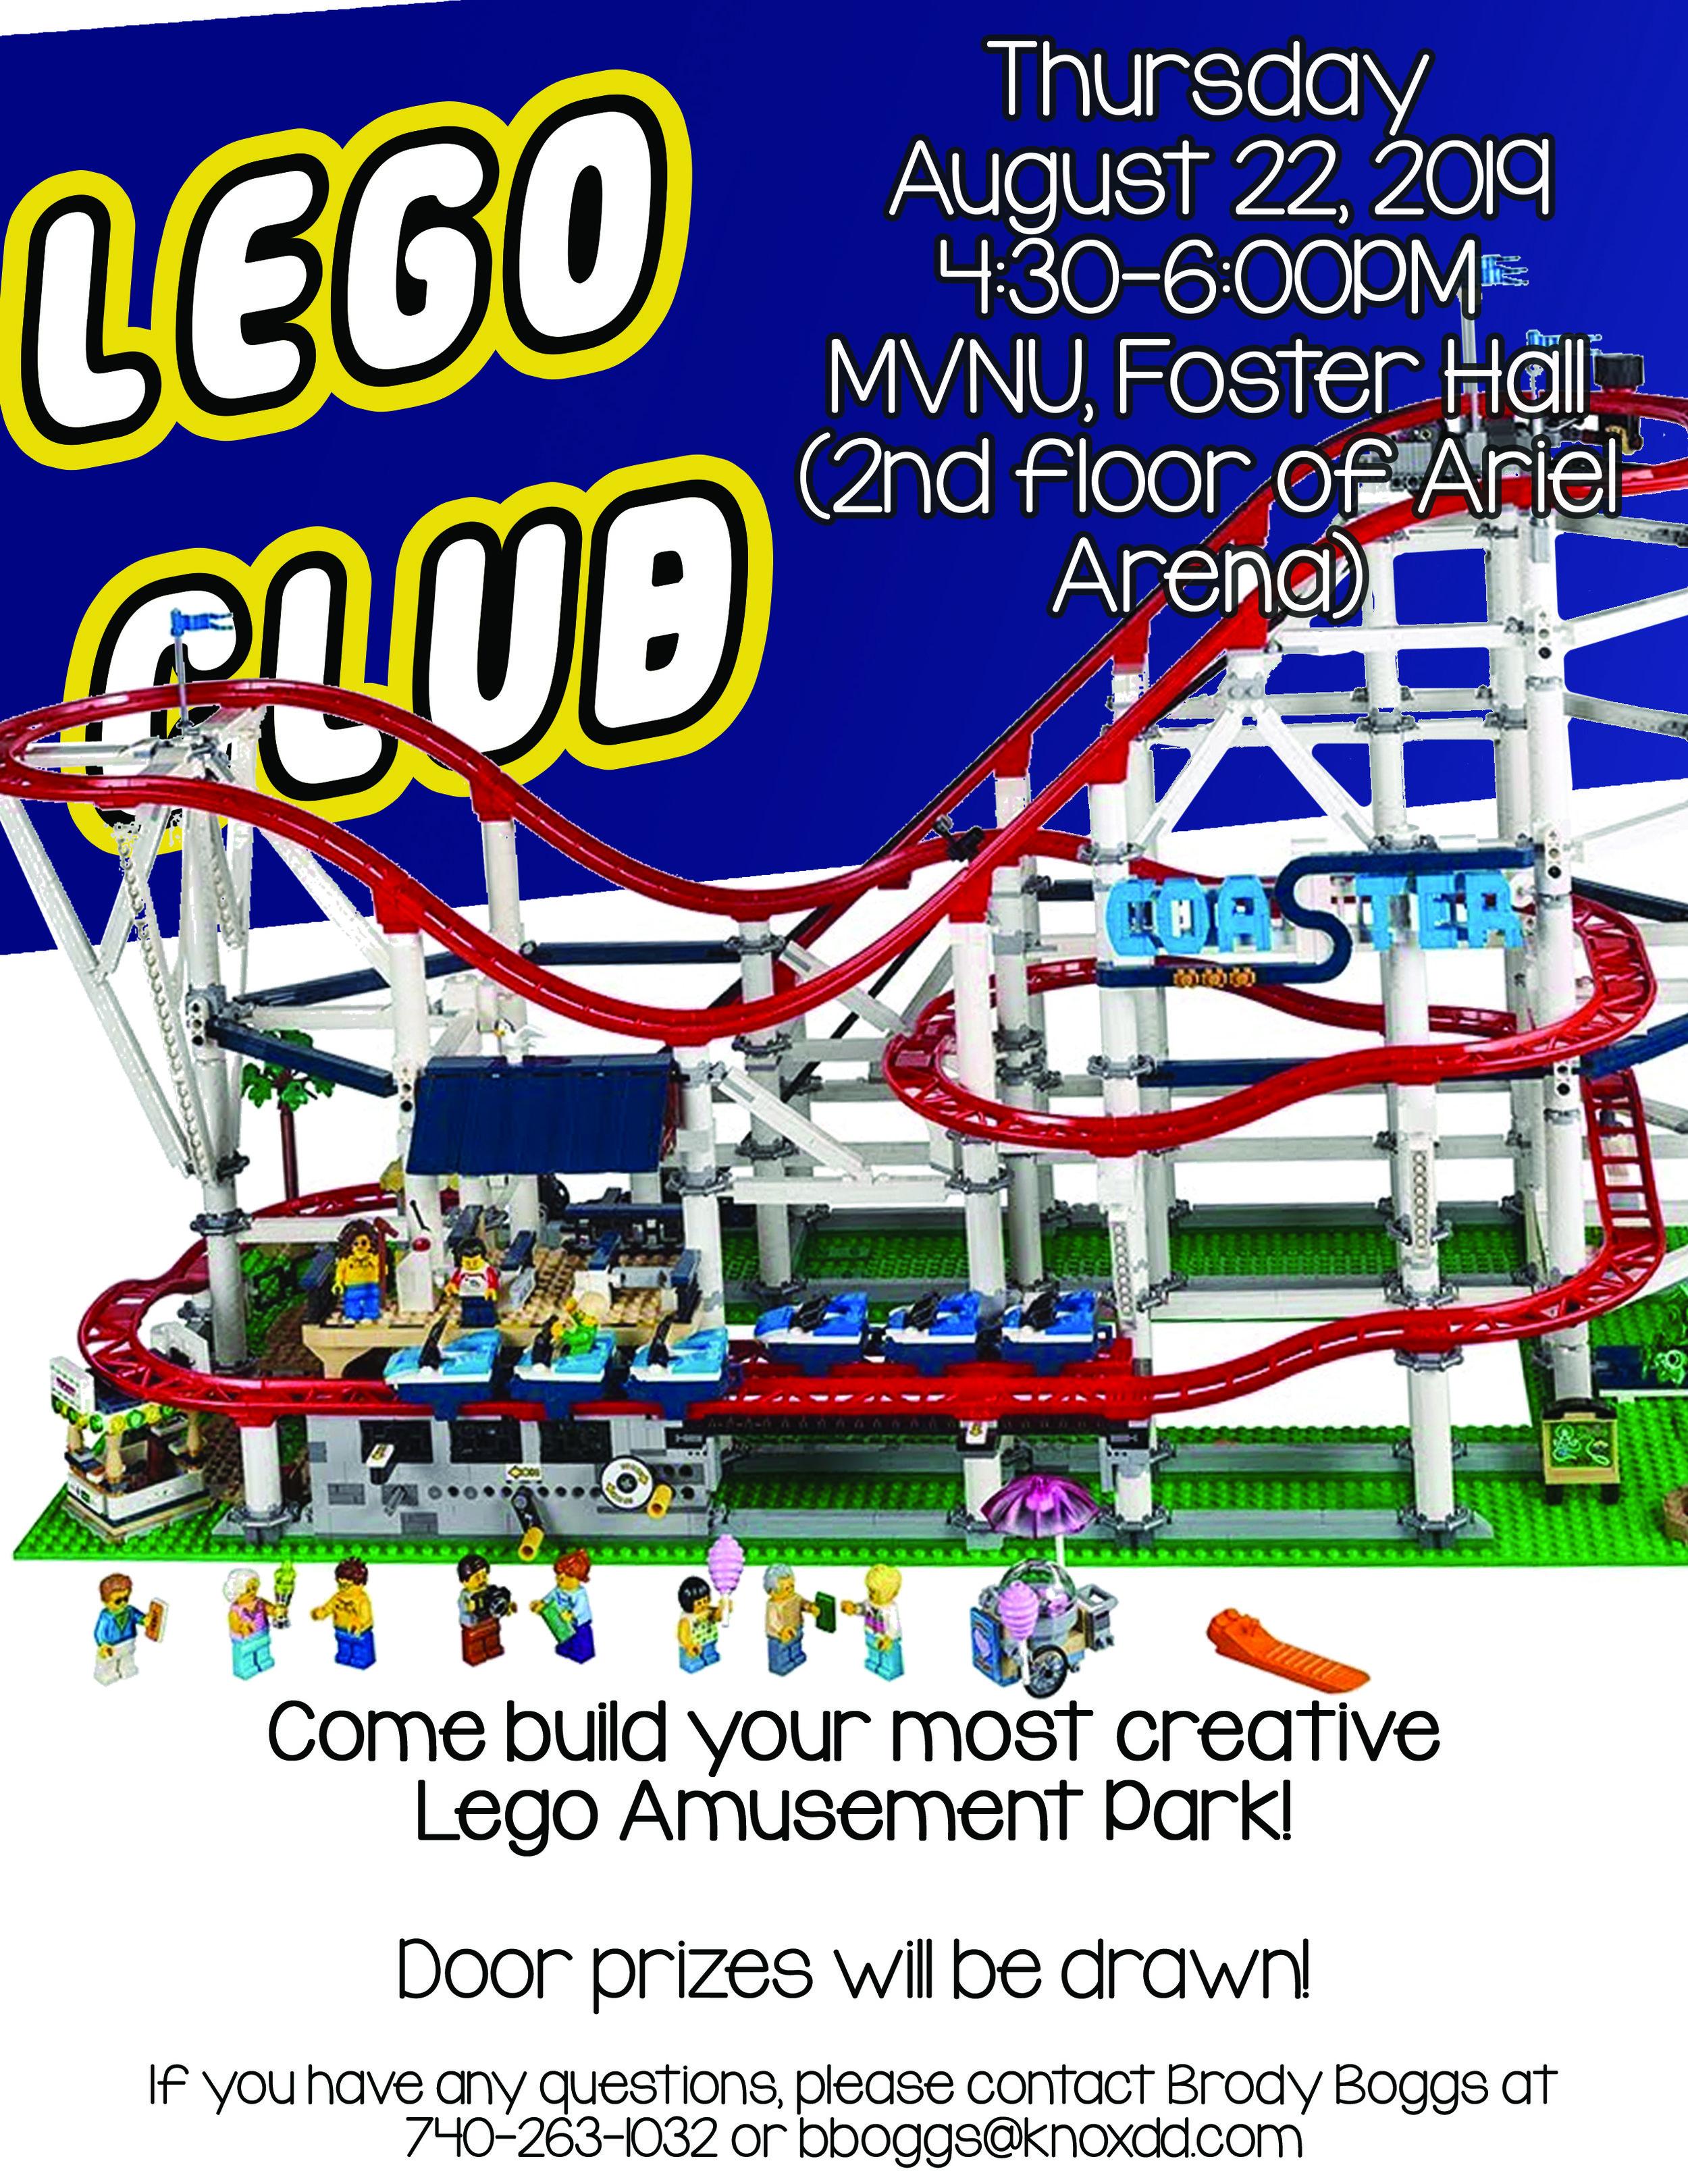 Lego Club flyer amusement park.jpg